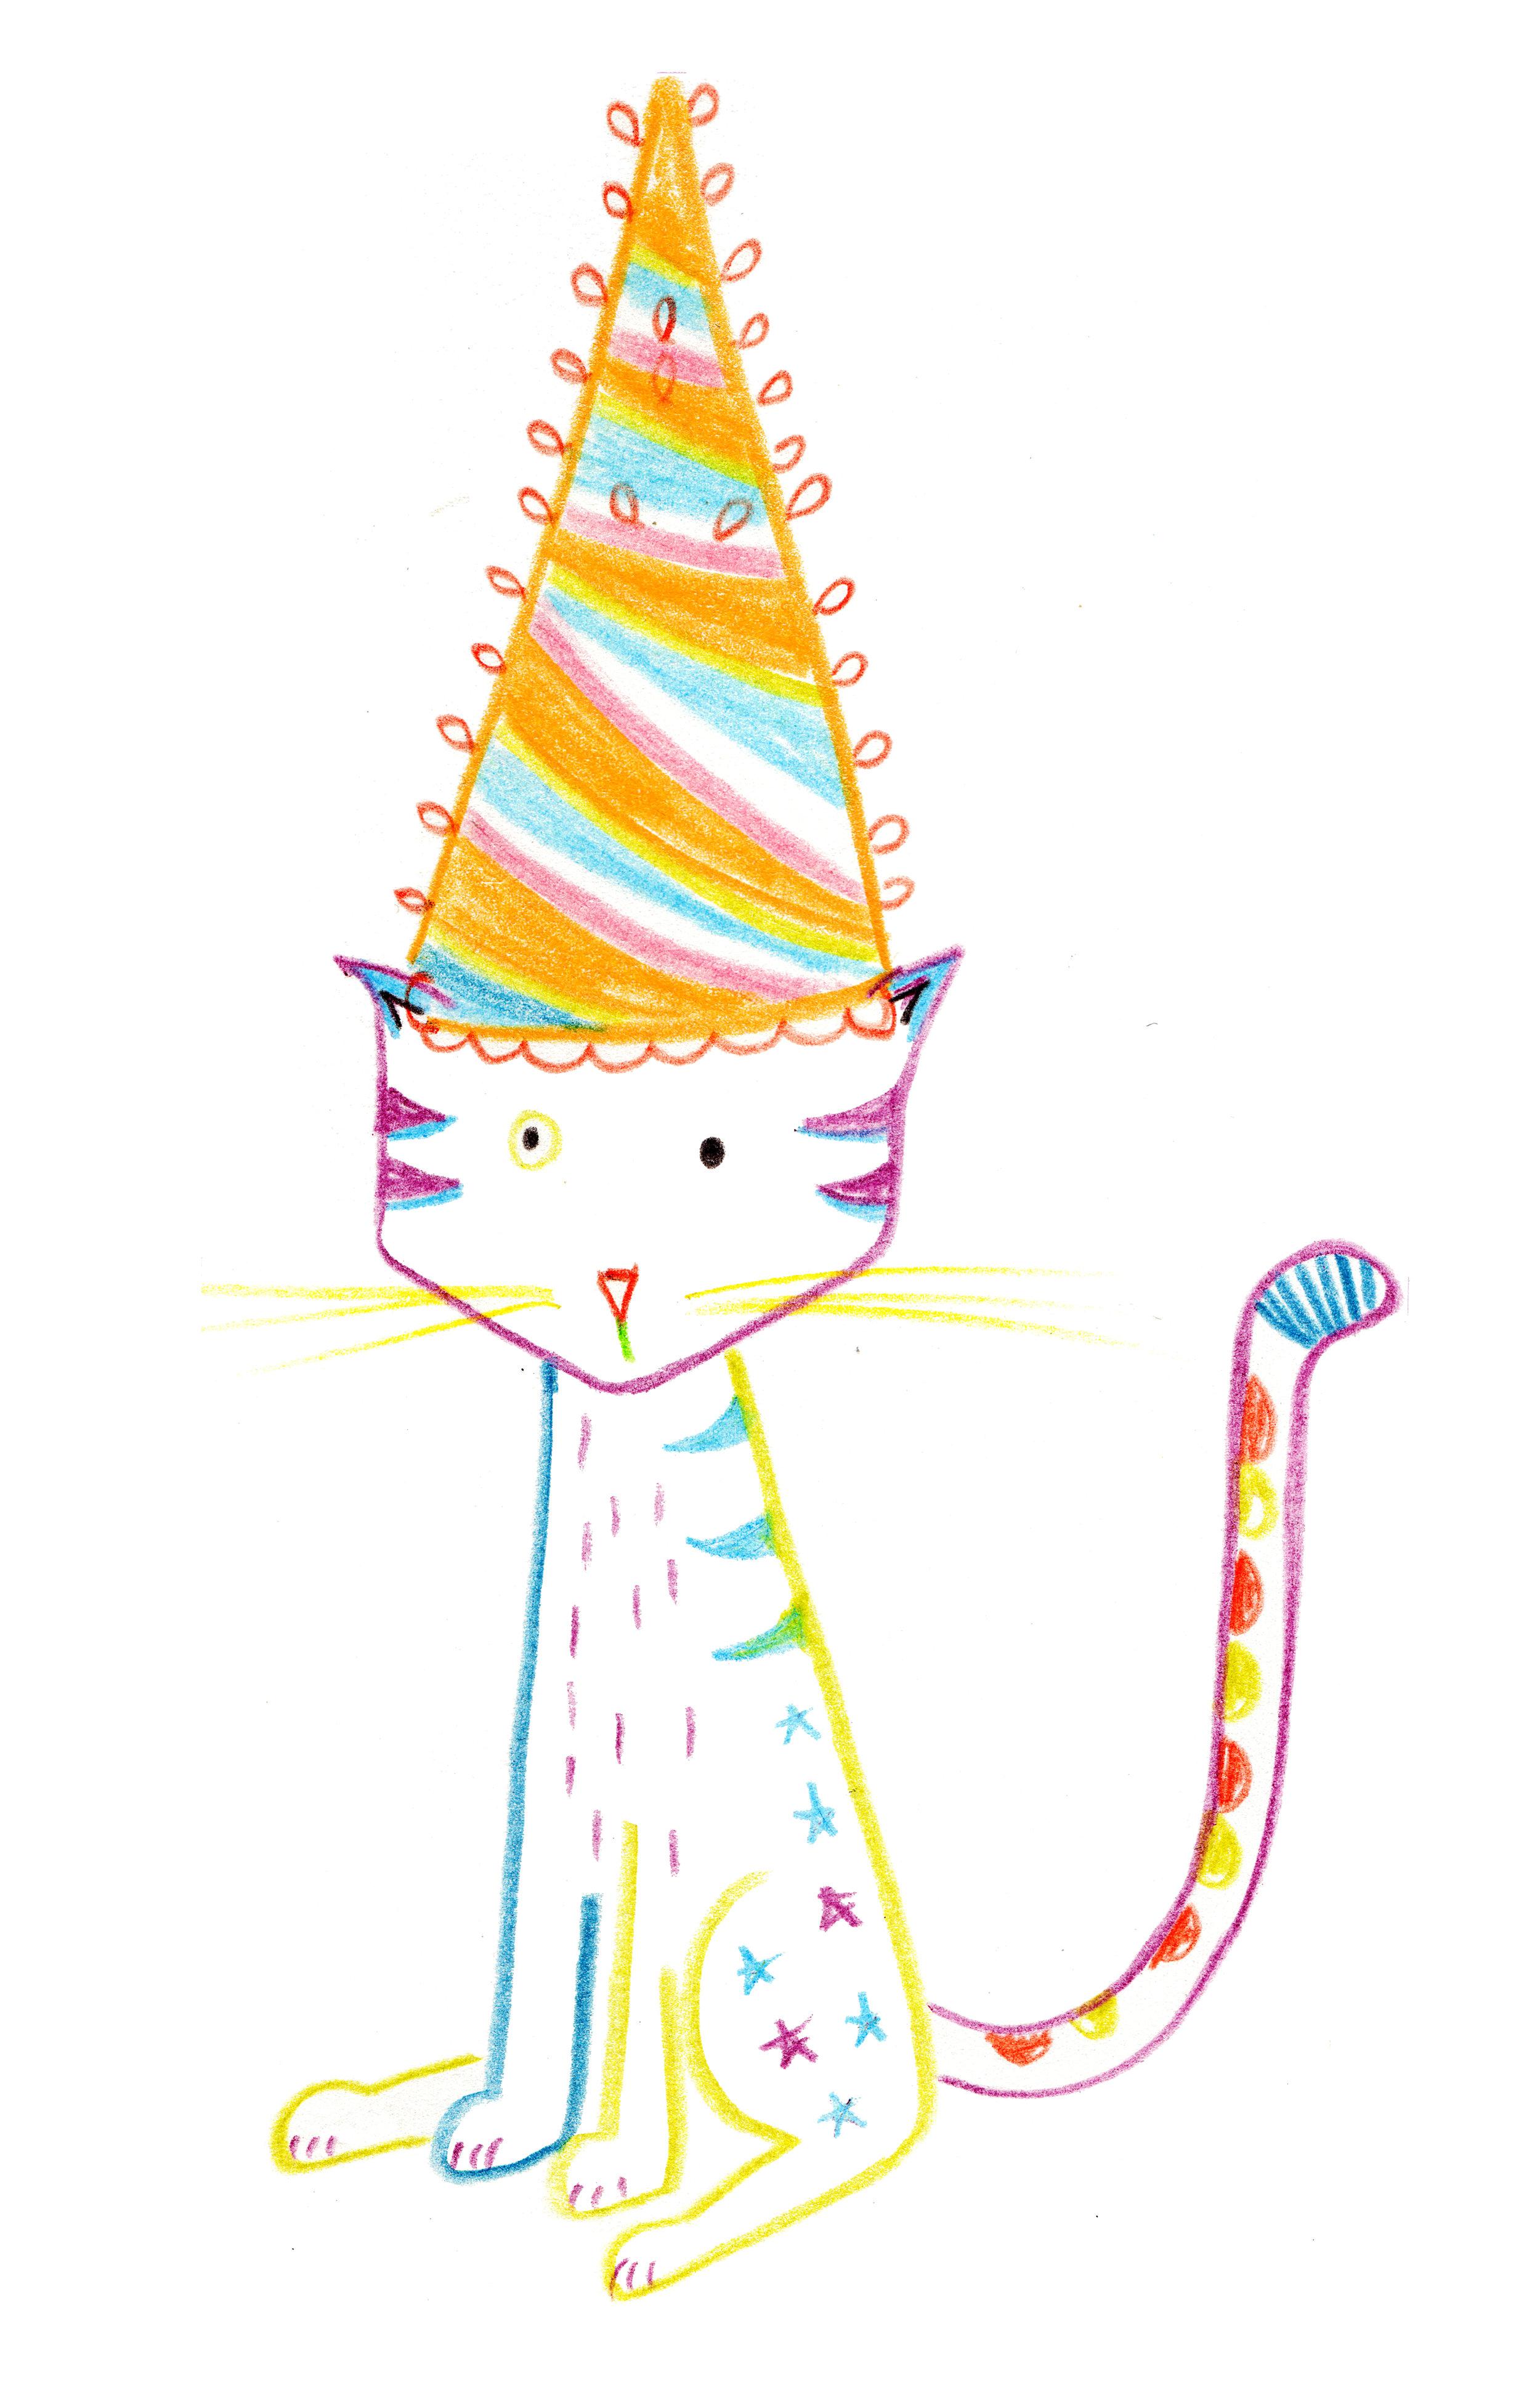 BC's birthday hat Sm.jpg